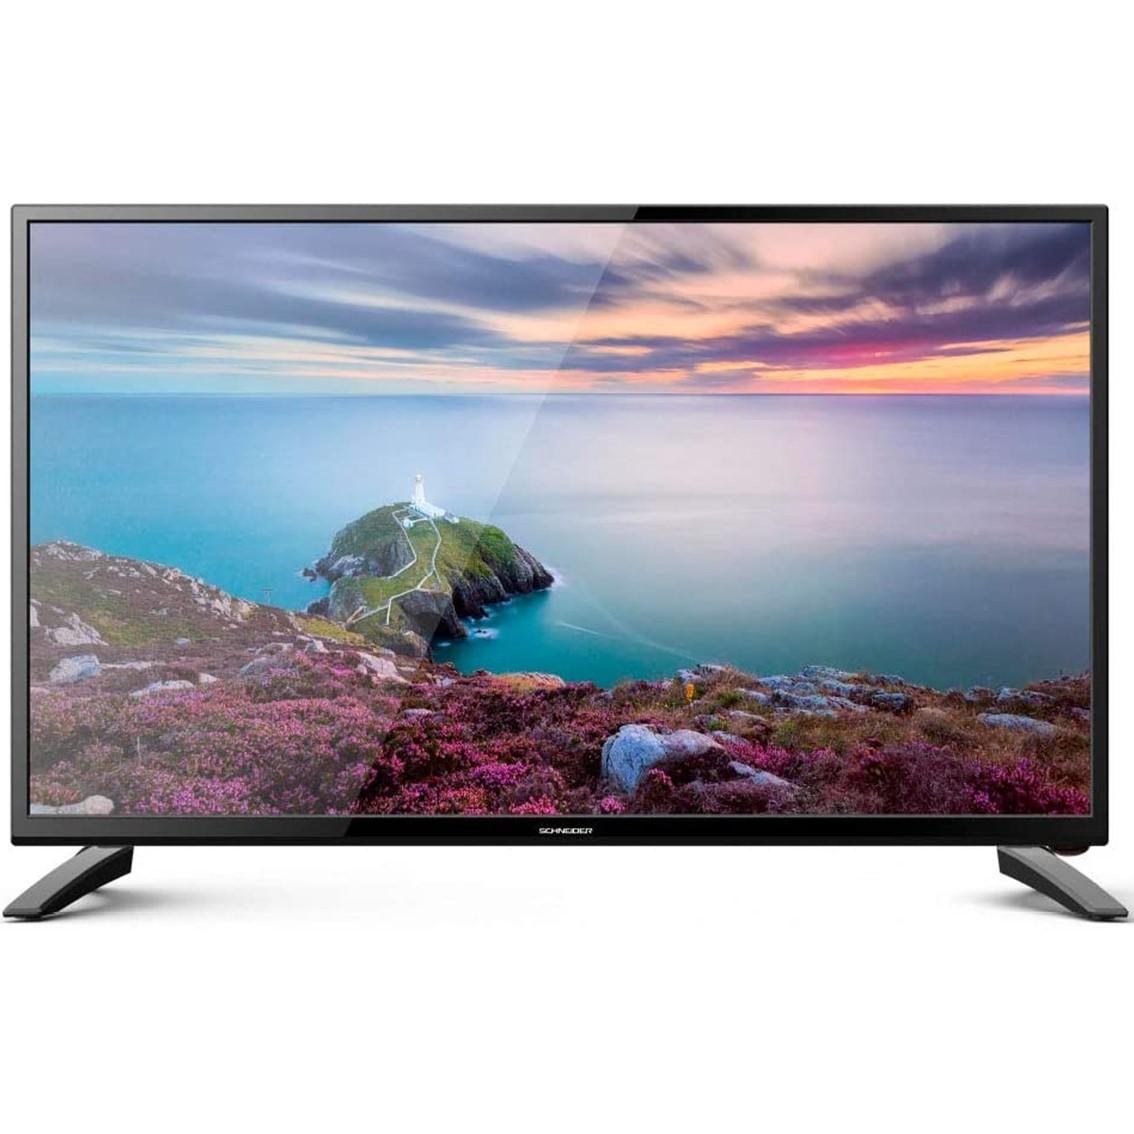 Tv schneider 24pulgadas full hd  - sc - led24sc510k -  hdmi -  usb -  vga -  modo hotel